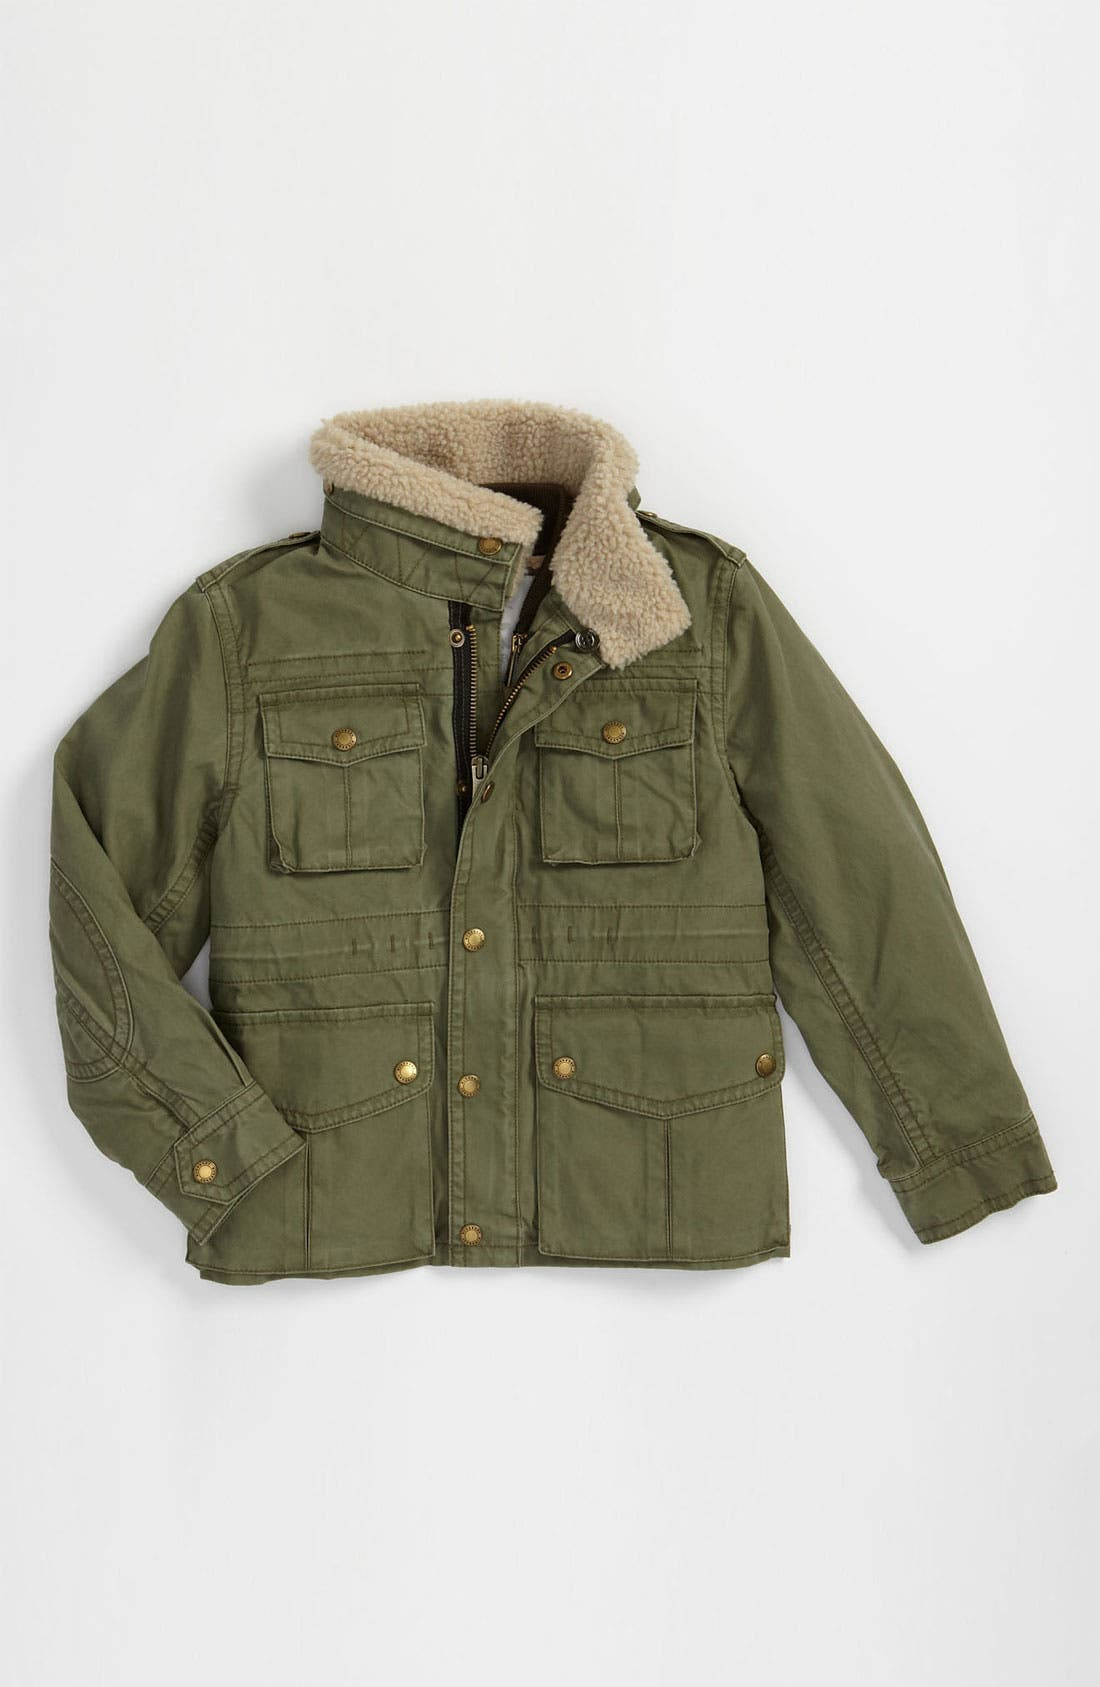 Alternate Image 1 Selected - Burberry Layered Jacket (Big Boys)